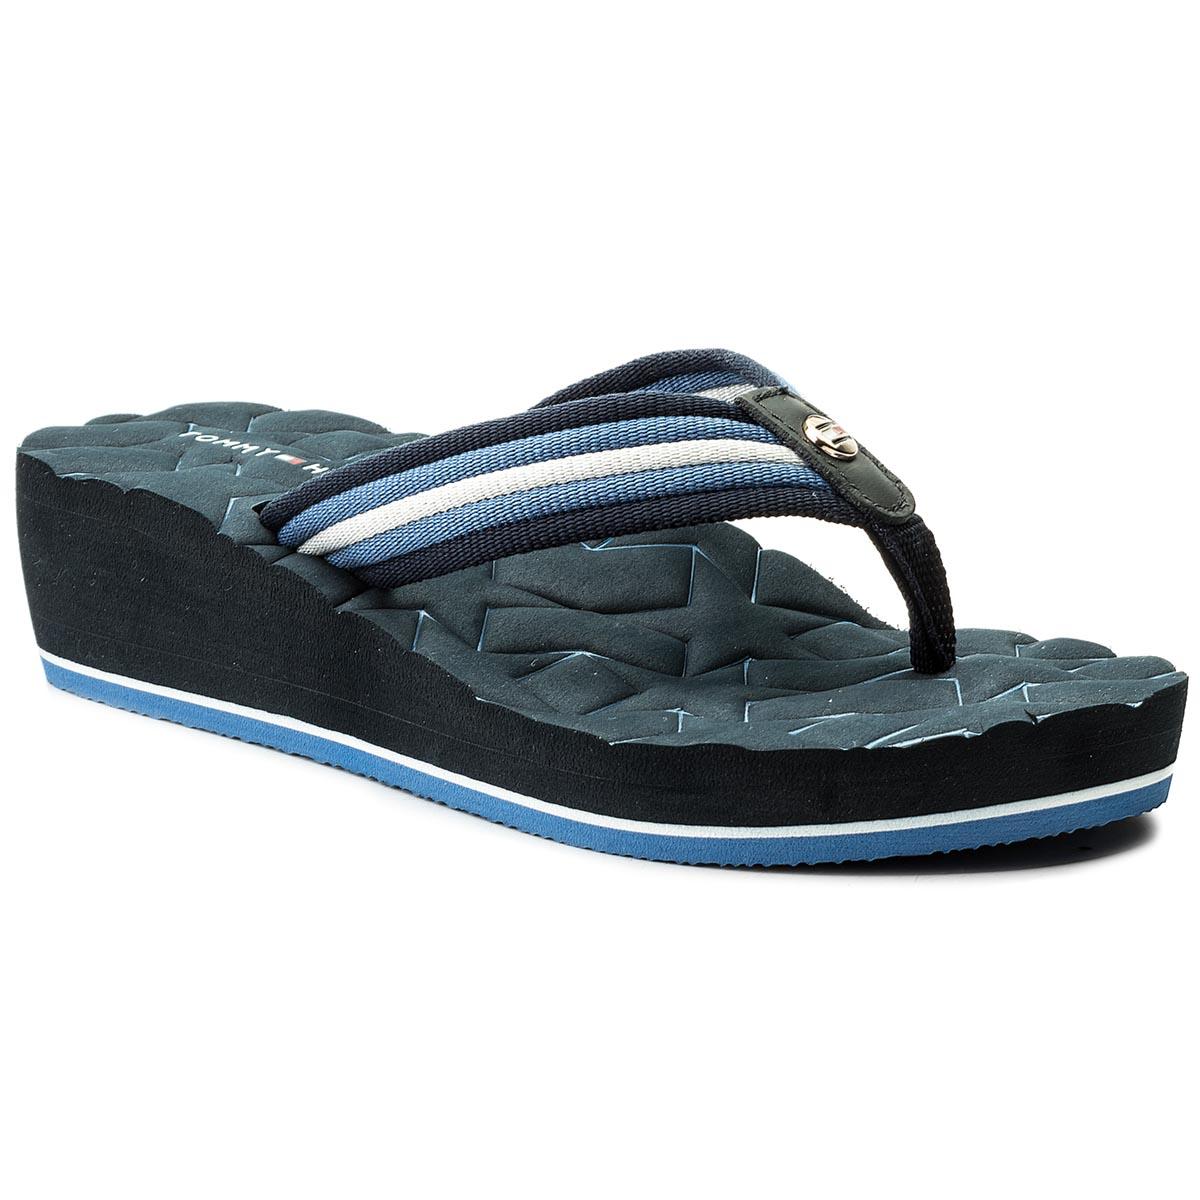 Žabky TOMMY HILFIGER - Comfort Mid Beach Sandal FW0FW02367 Midnight ... 804ce69b5a